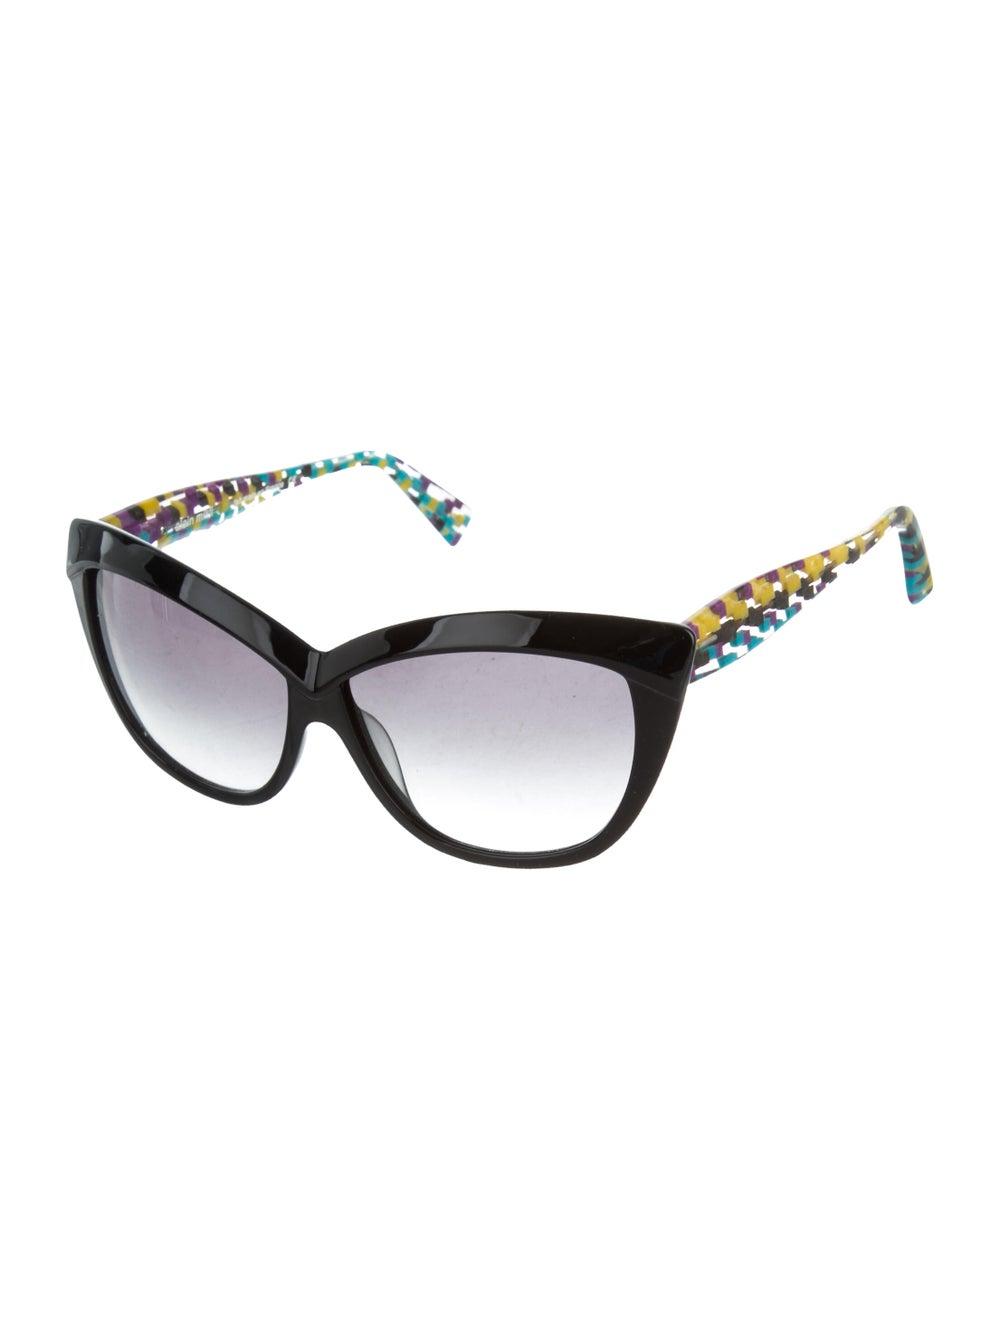 Alain Mikli Gradient Cat-Eye Sunglasses Black - image 2